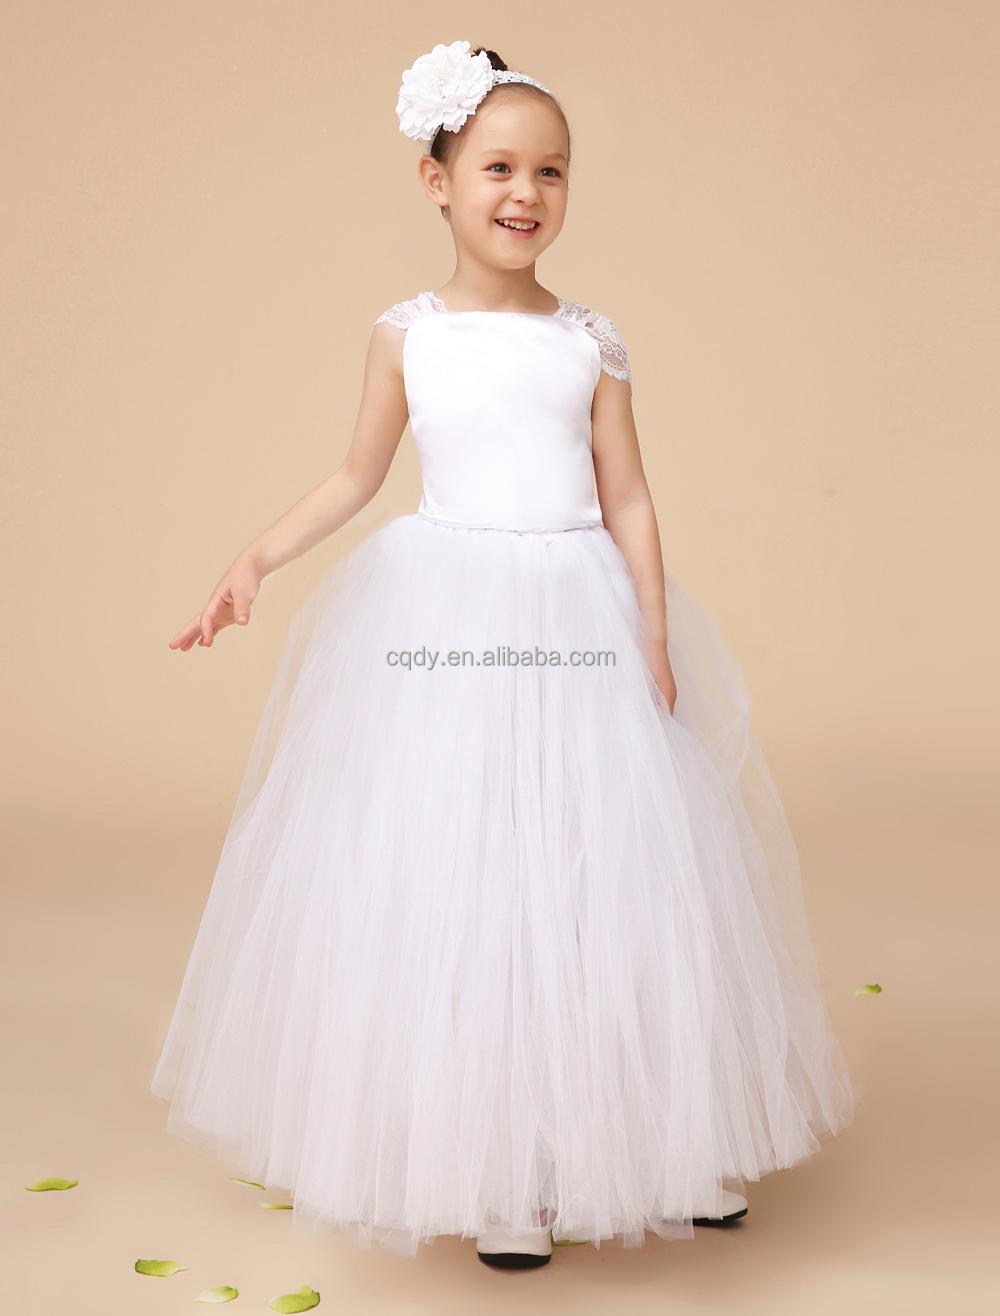 Lovely Lace Princess Tutu Dress Baby Girls Party Dresses Flower